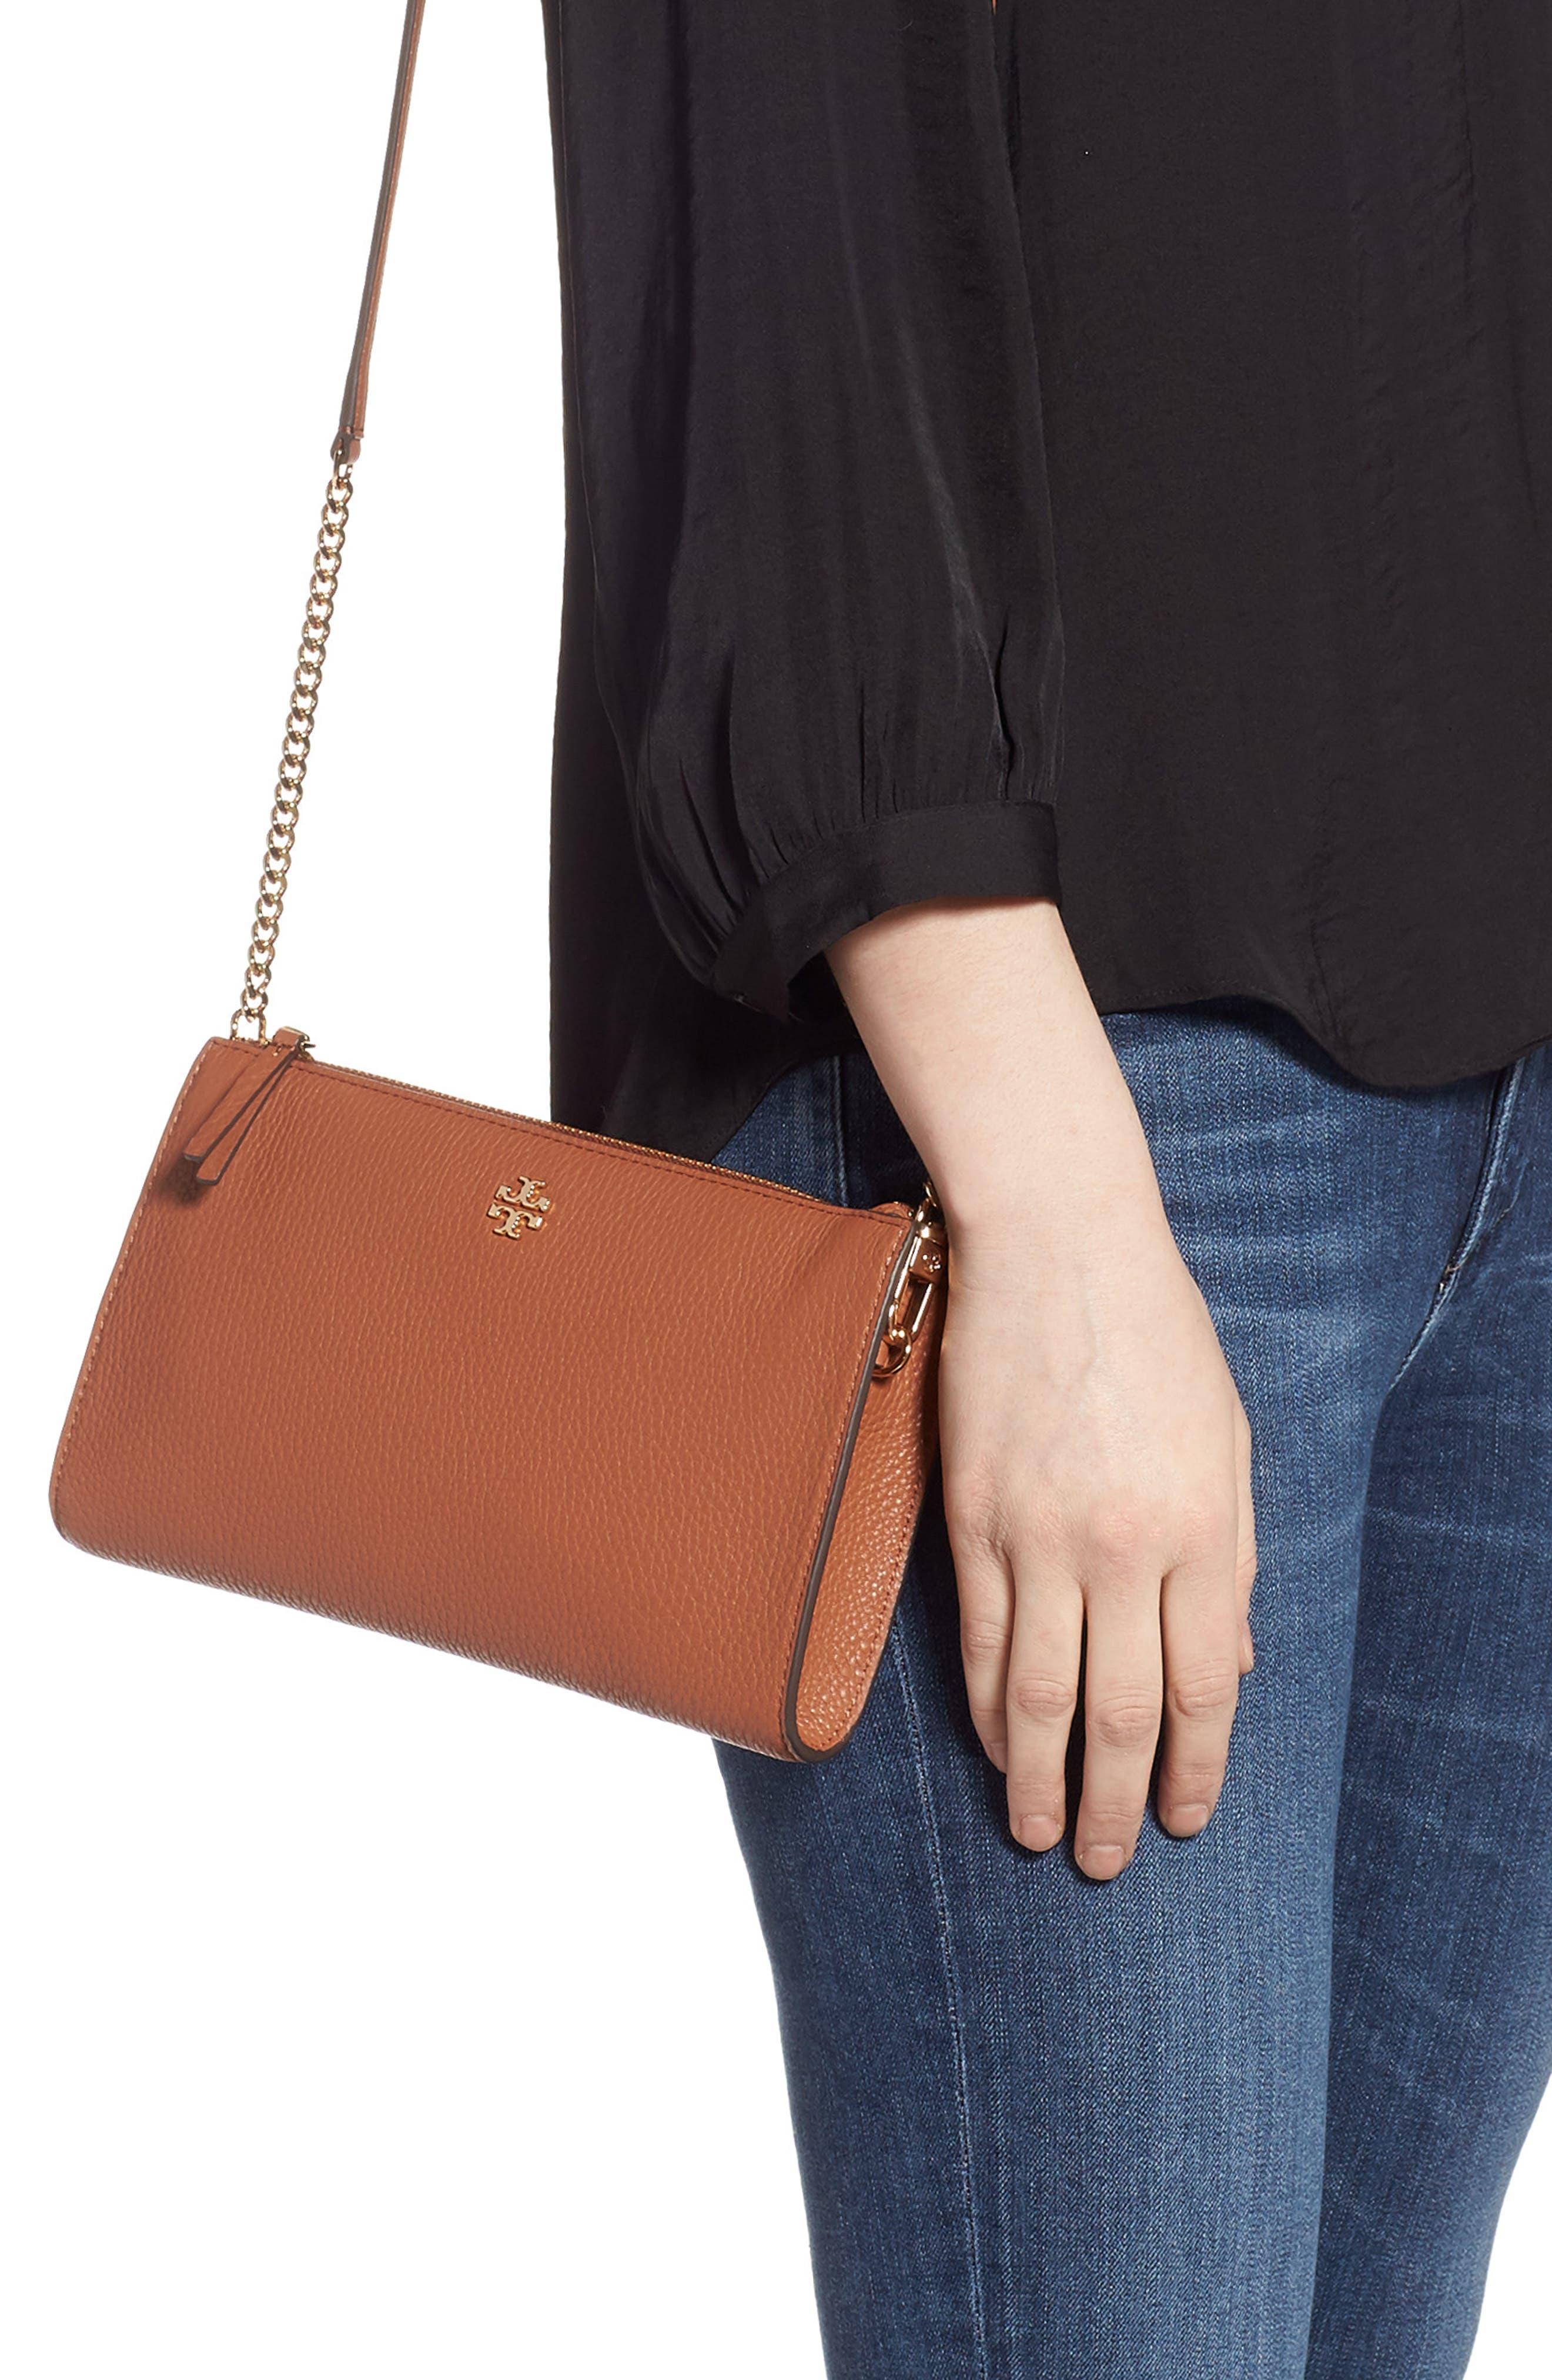 TORY BURCH,                             Pebbled Leather Top Zip Crossbody Bag,                             Alternate thumbnail 2, color,                             CLASSIC TAN